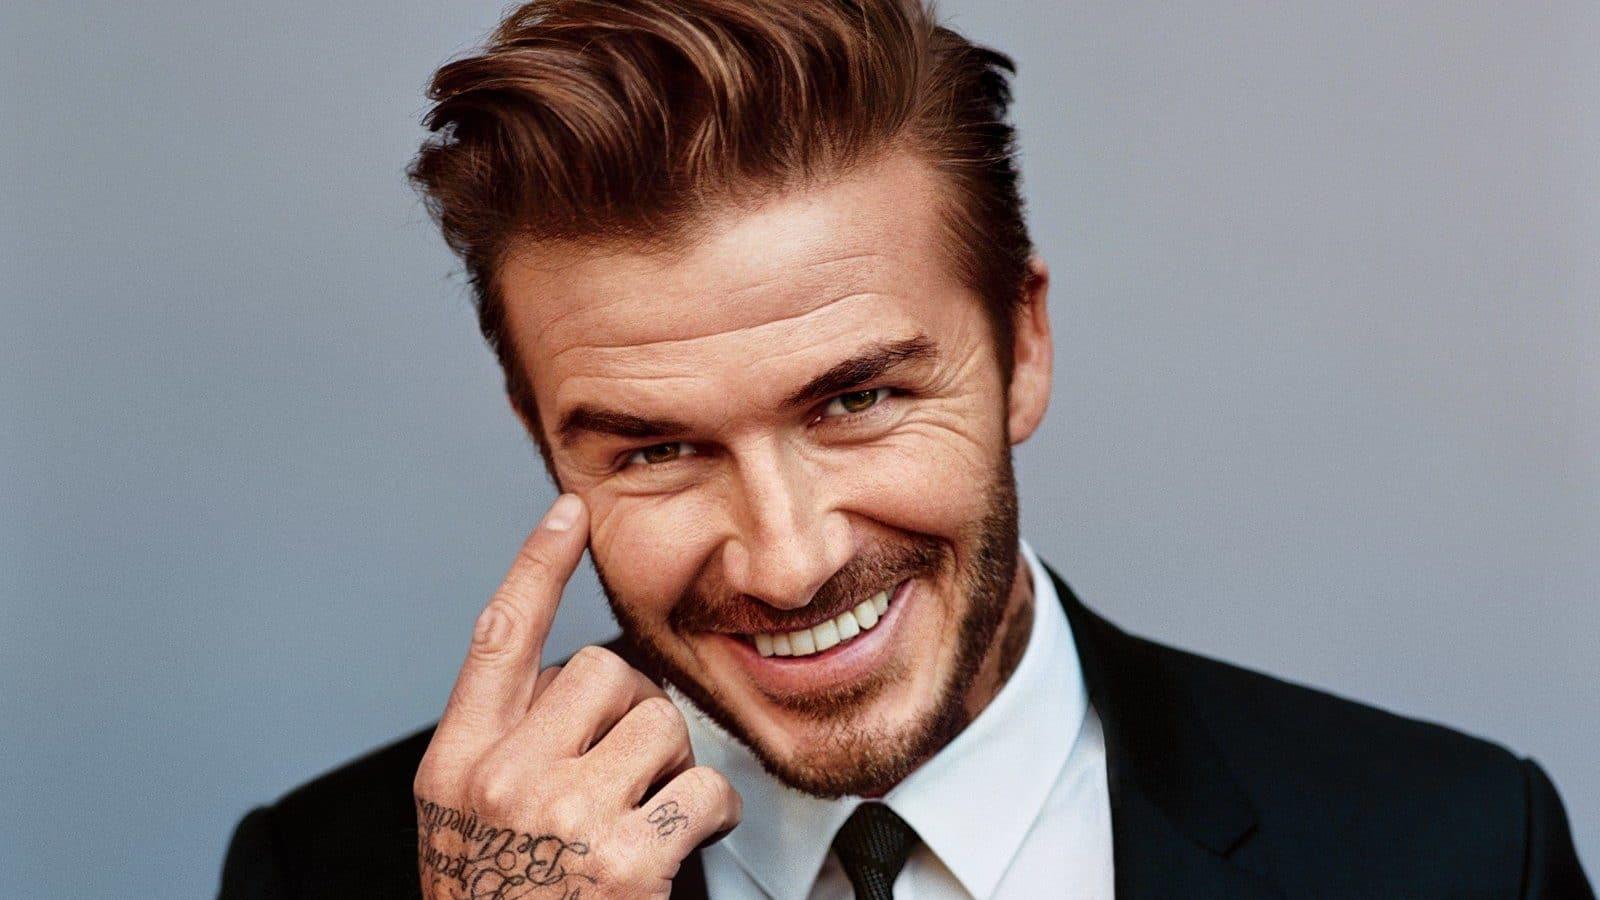 David Beckham fashion icon